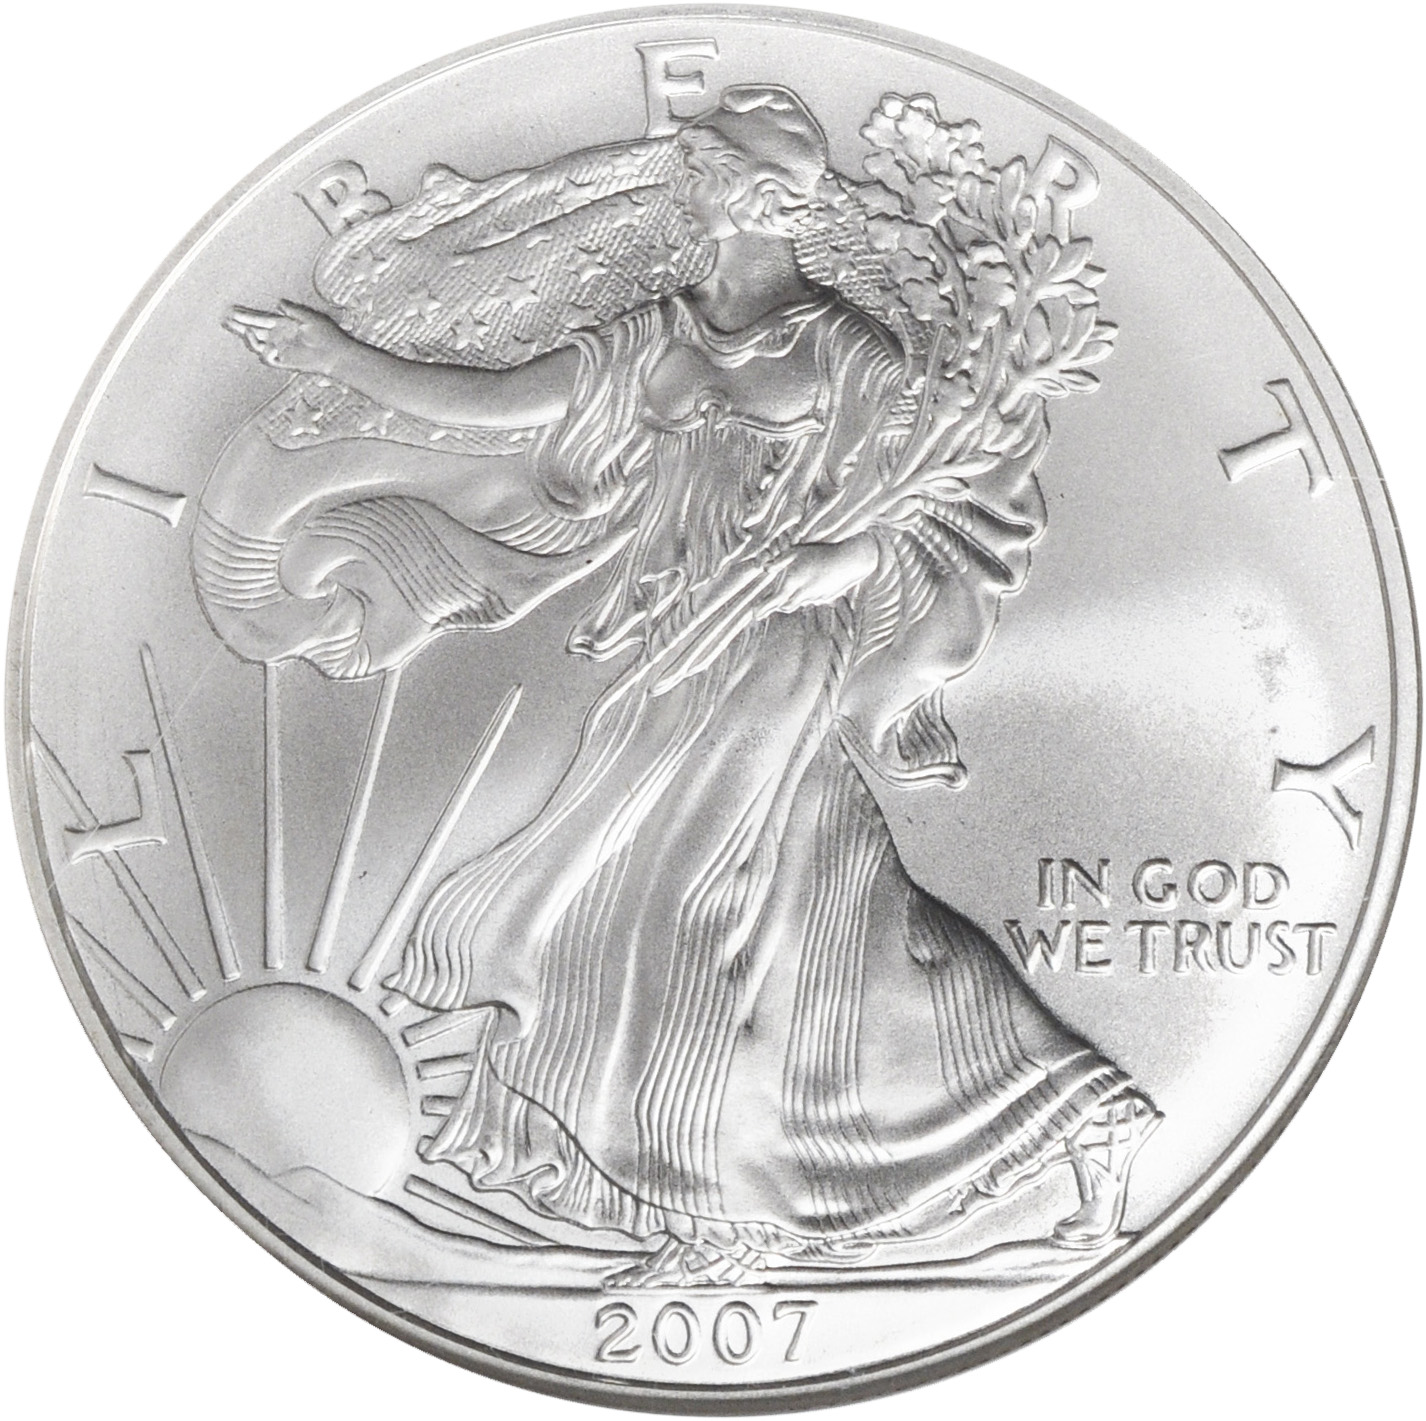 2007 GOLD /& PLATINUM Plate SILVER AMERICAN EAGLE 1 OZ 999 Coin L Williams